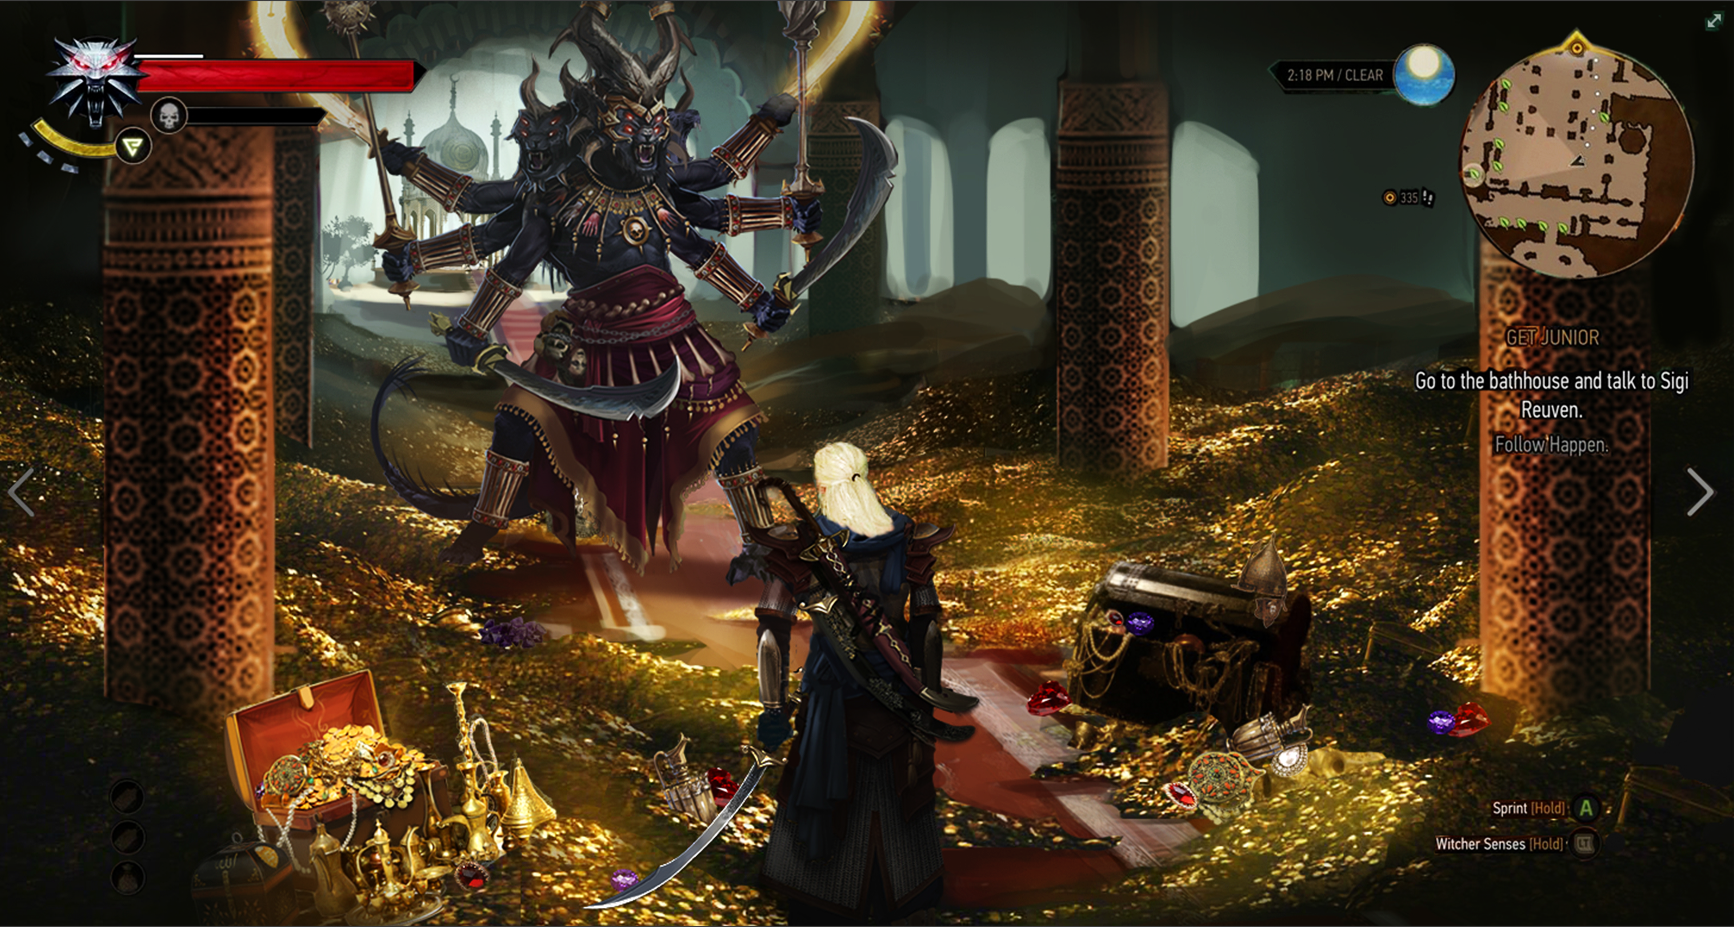 фейкшот - Witcher 3: Wild Hunt, the